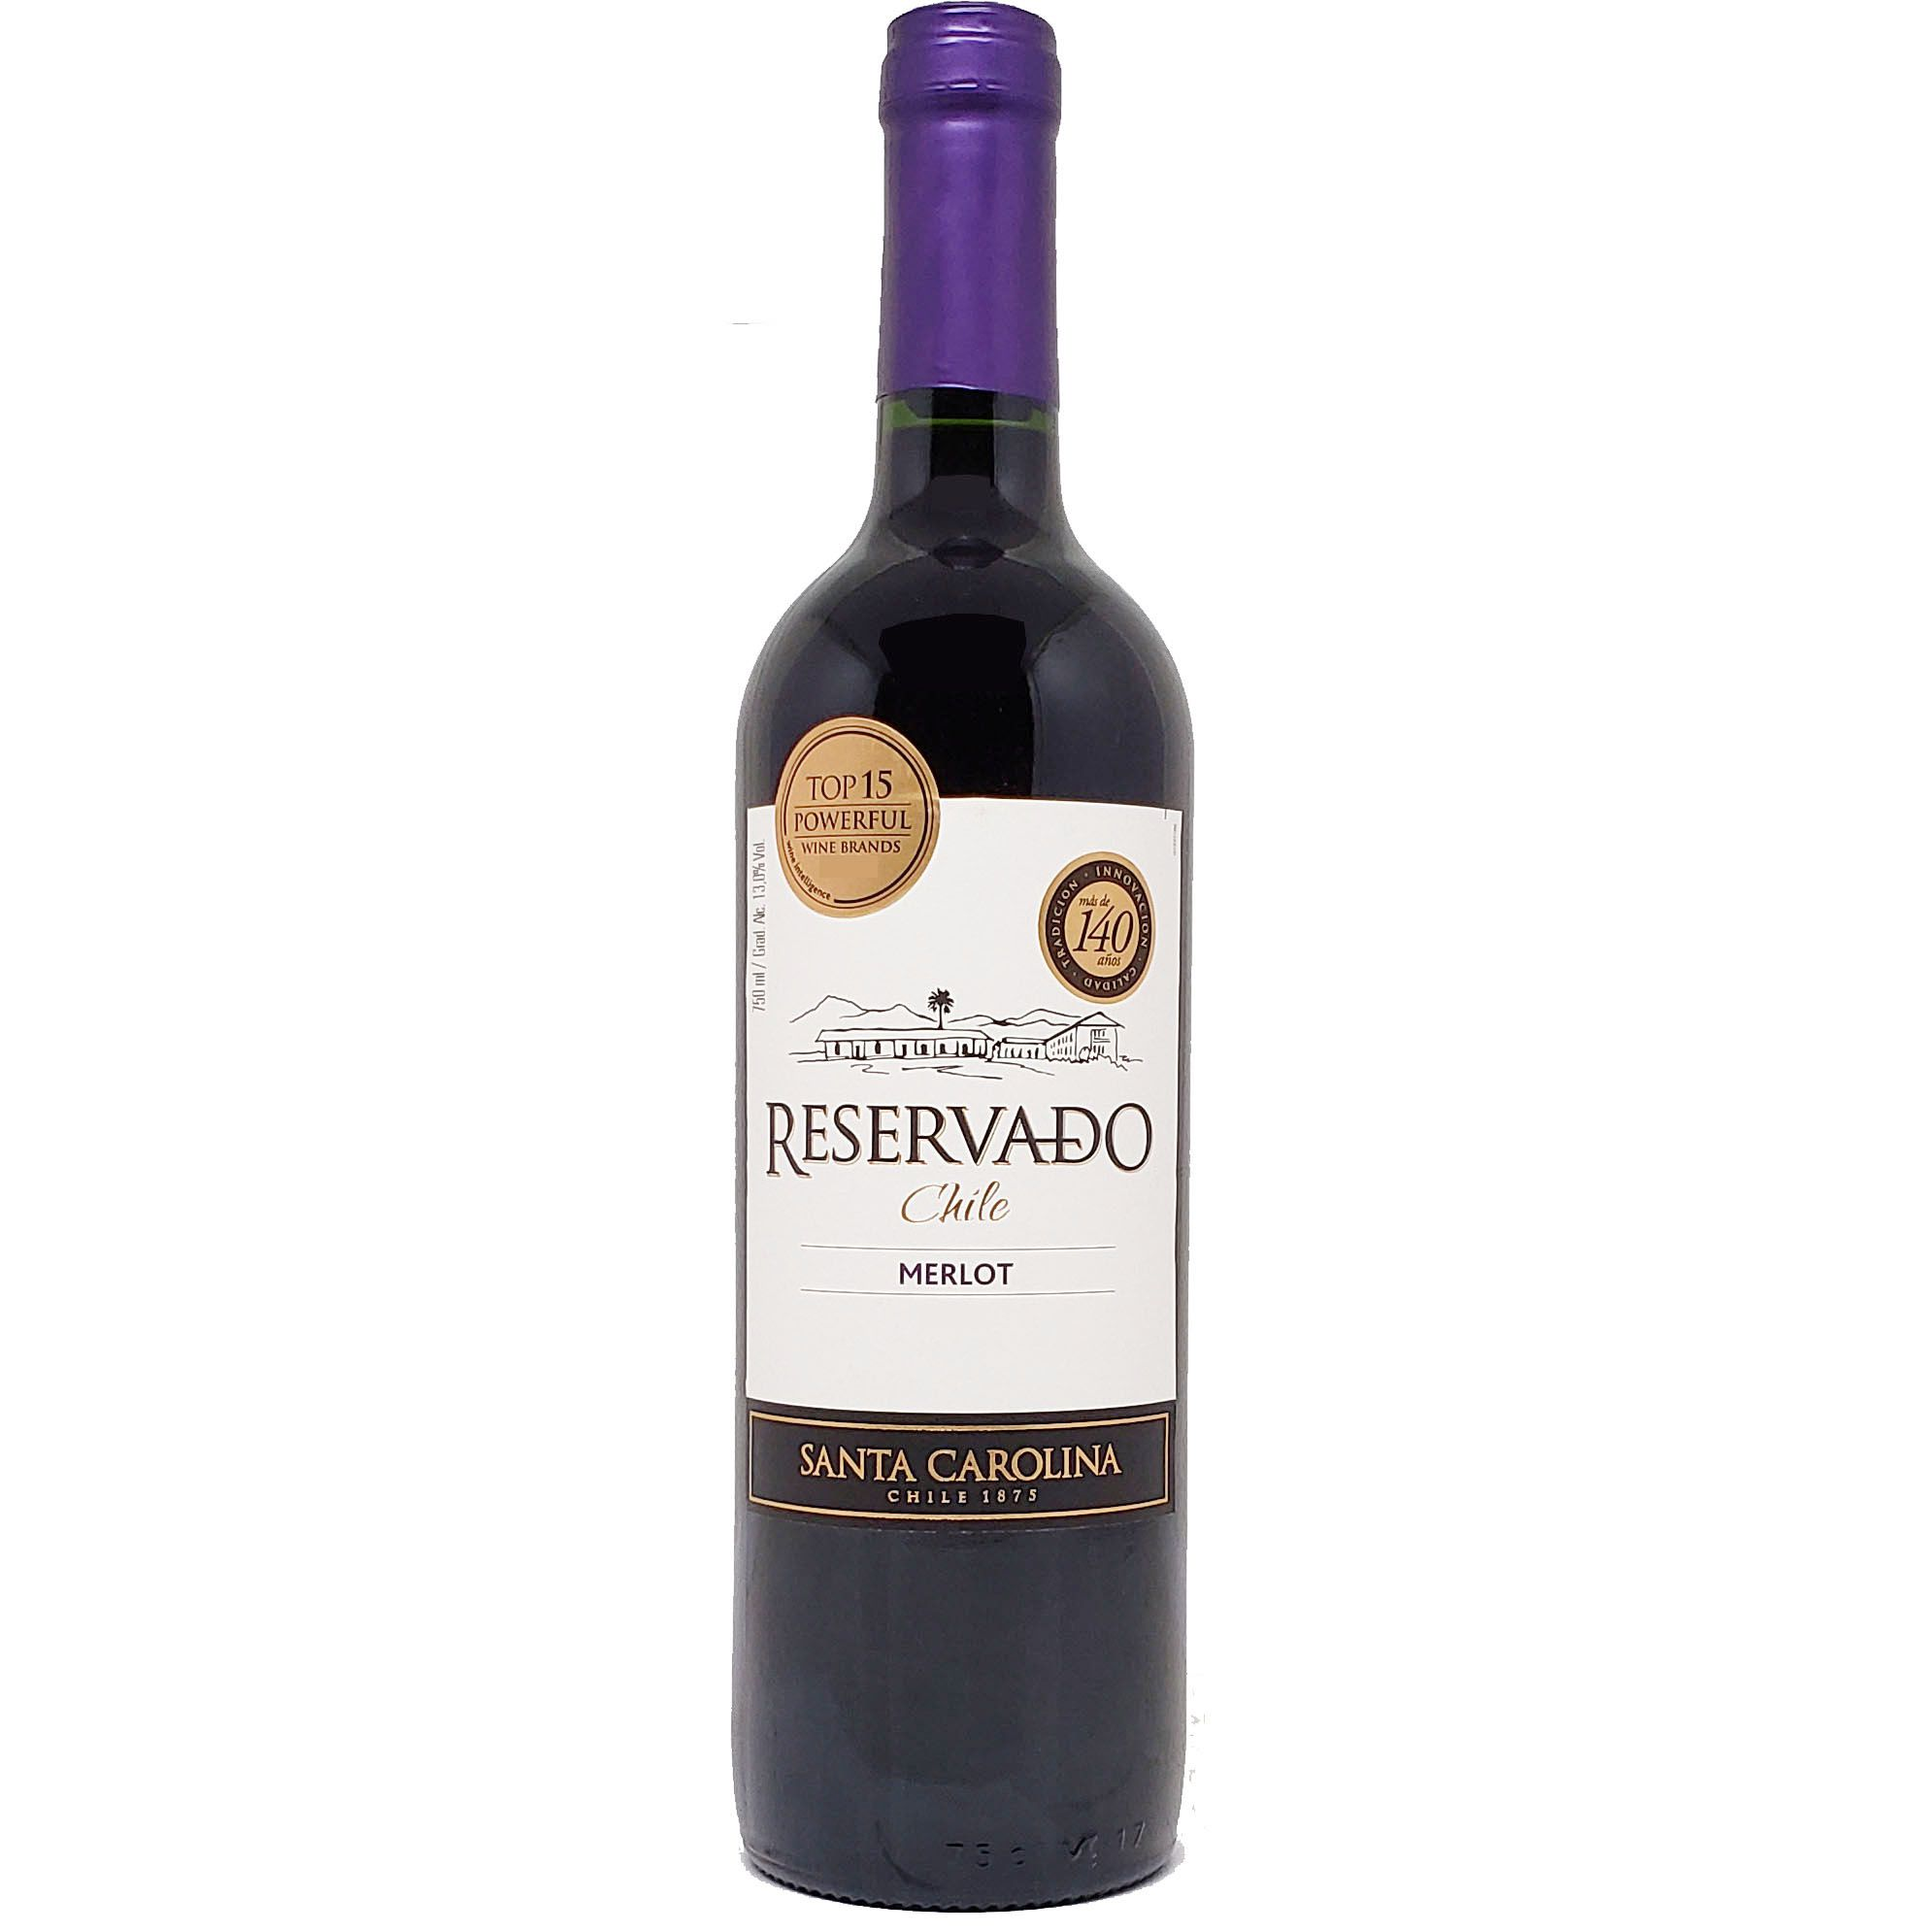 Vinho Tinto Reservado Merlot Santa Carolina  - 750ml -